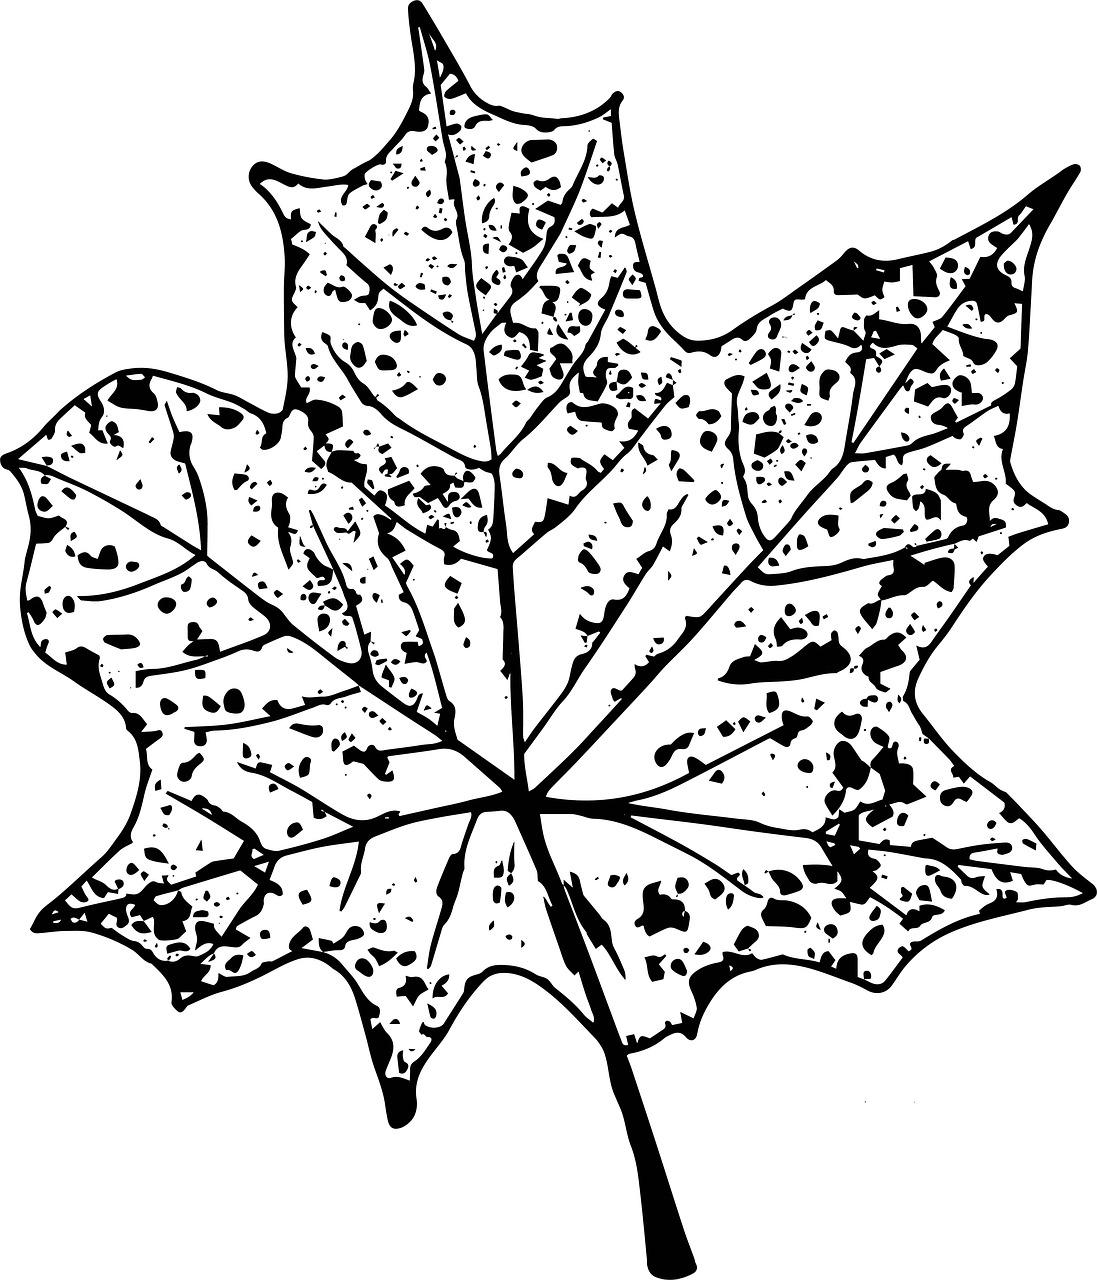 Осенний листик картинки черно белые